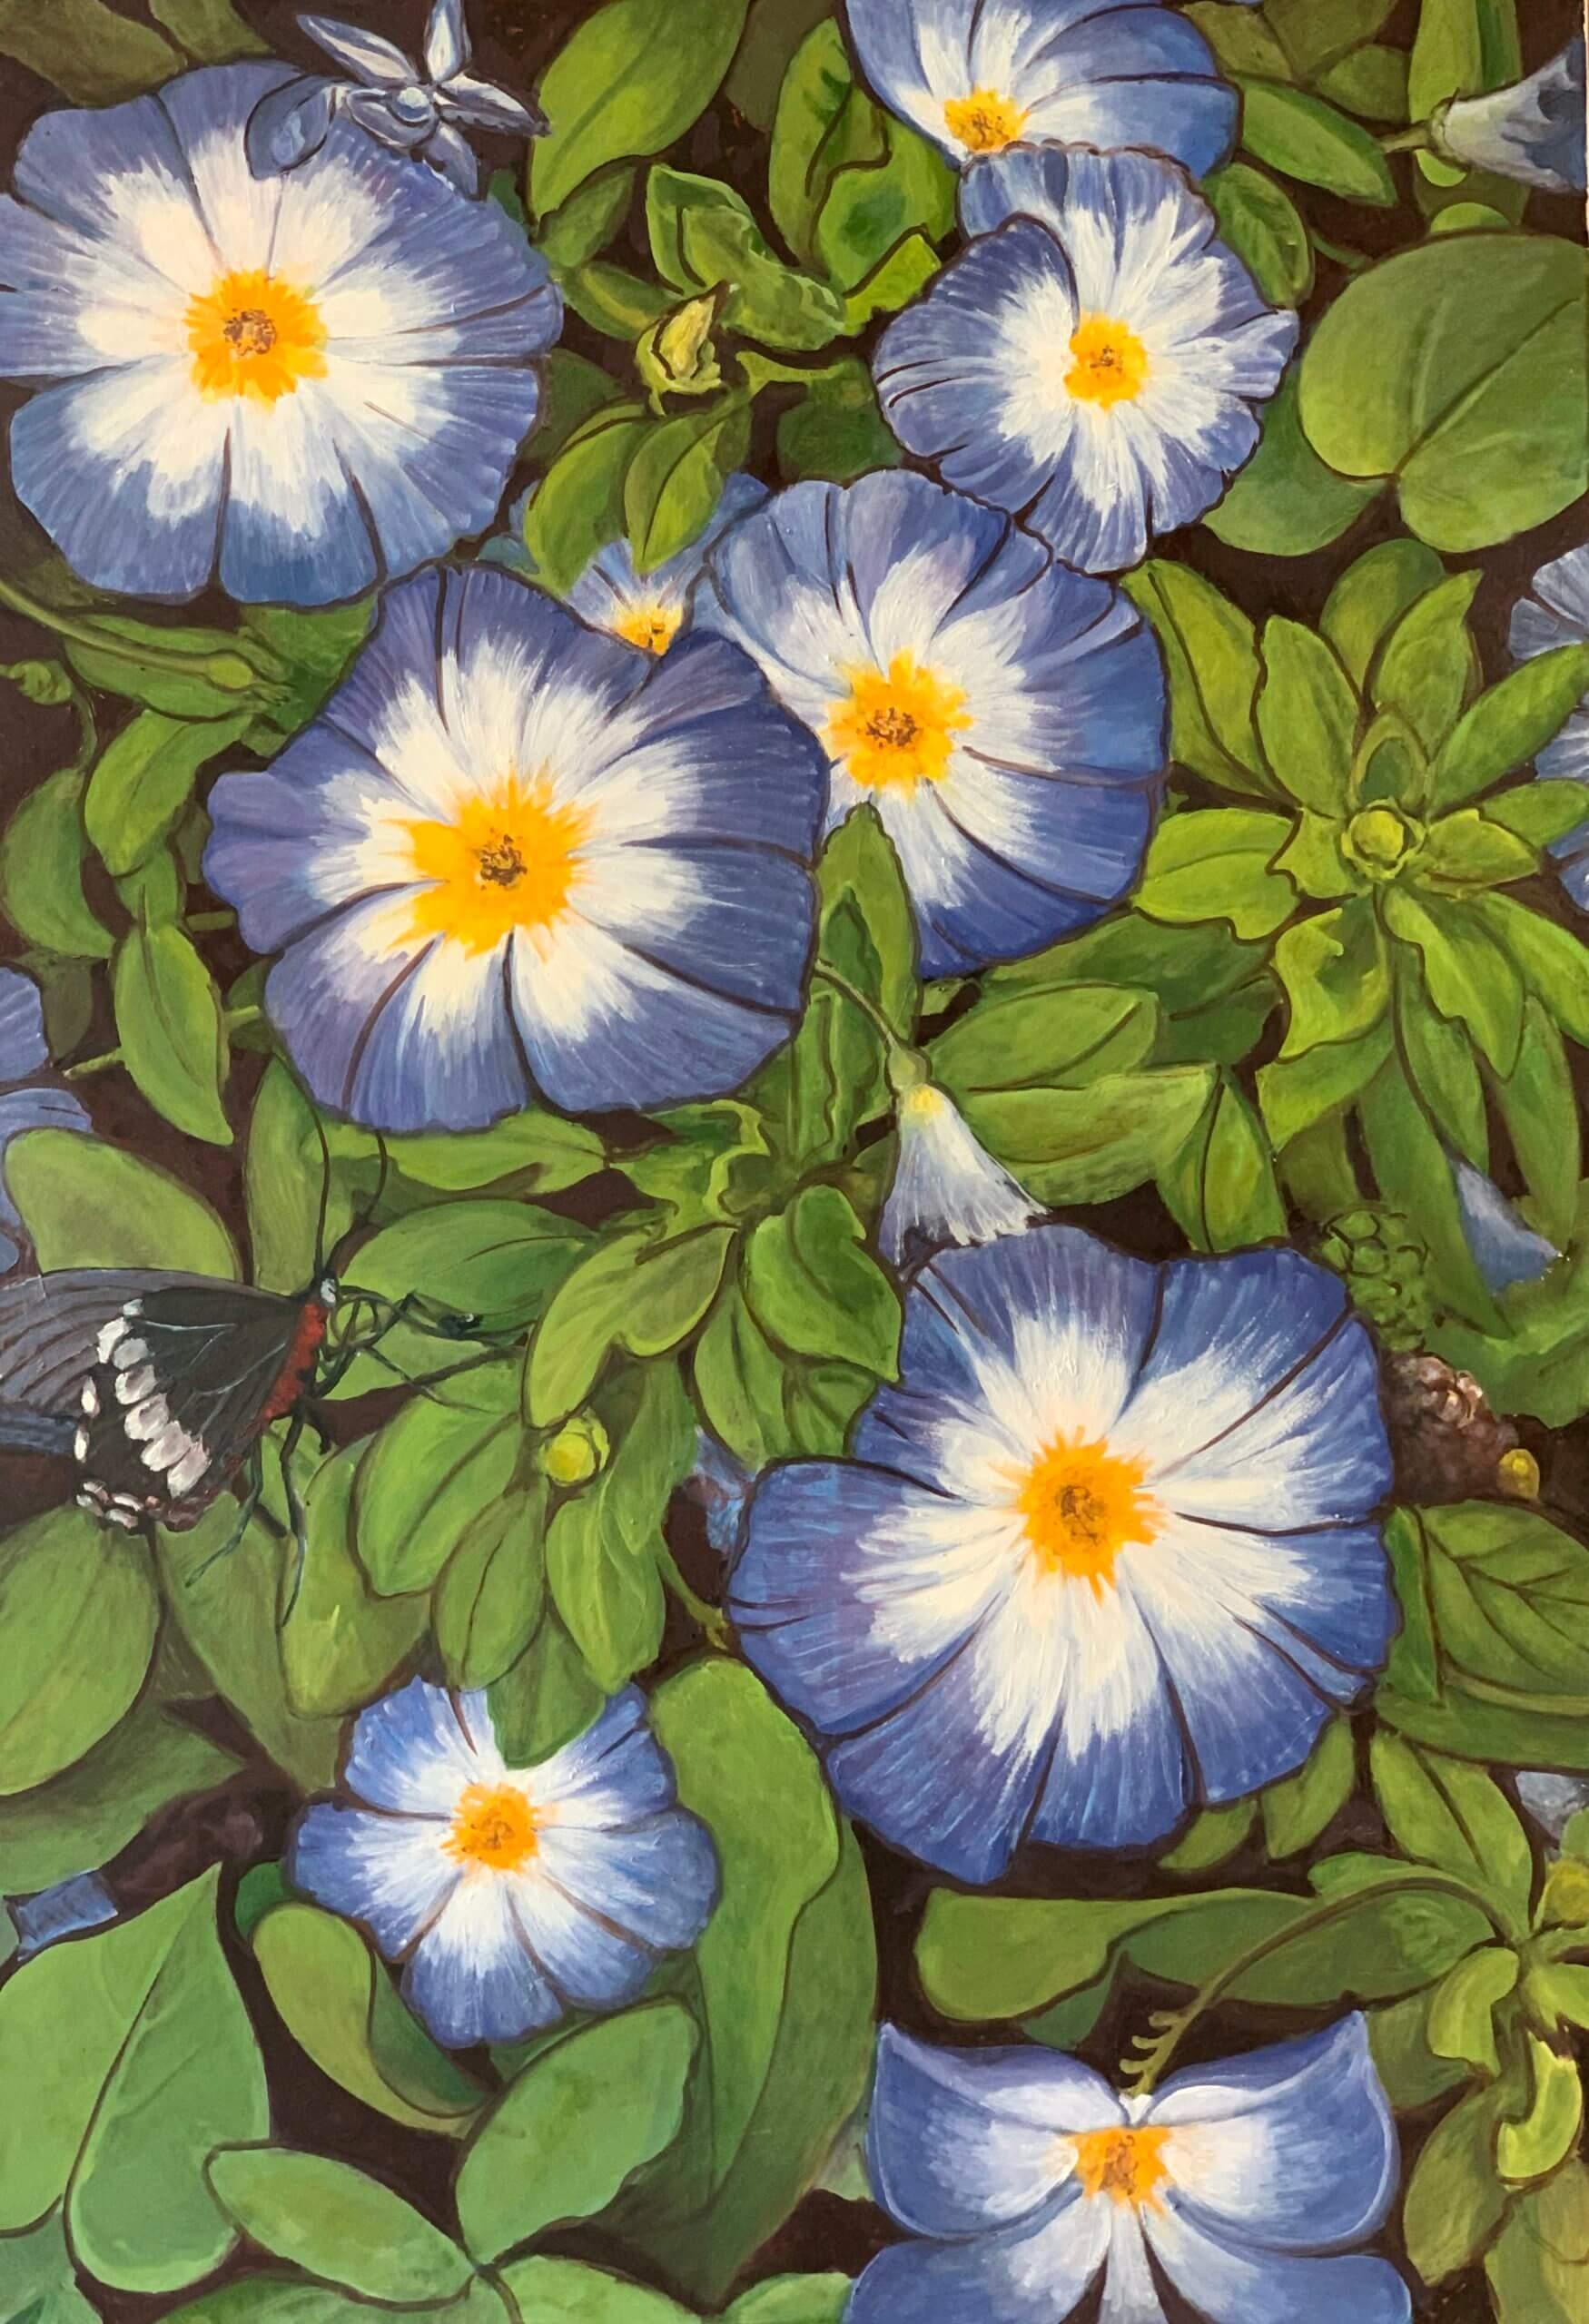 Diskussion in Blau (Blaue Blumen), 130x90 cm, 2017, Öl auf Leinwand Tatjana Meier